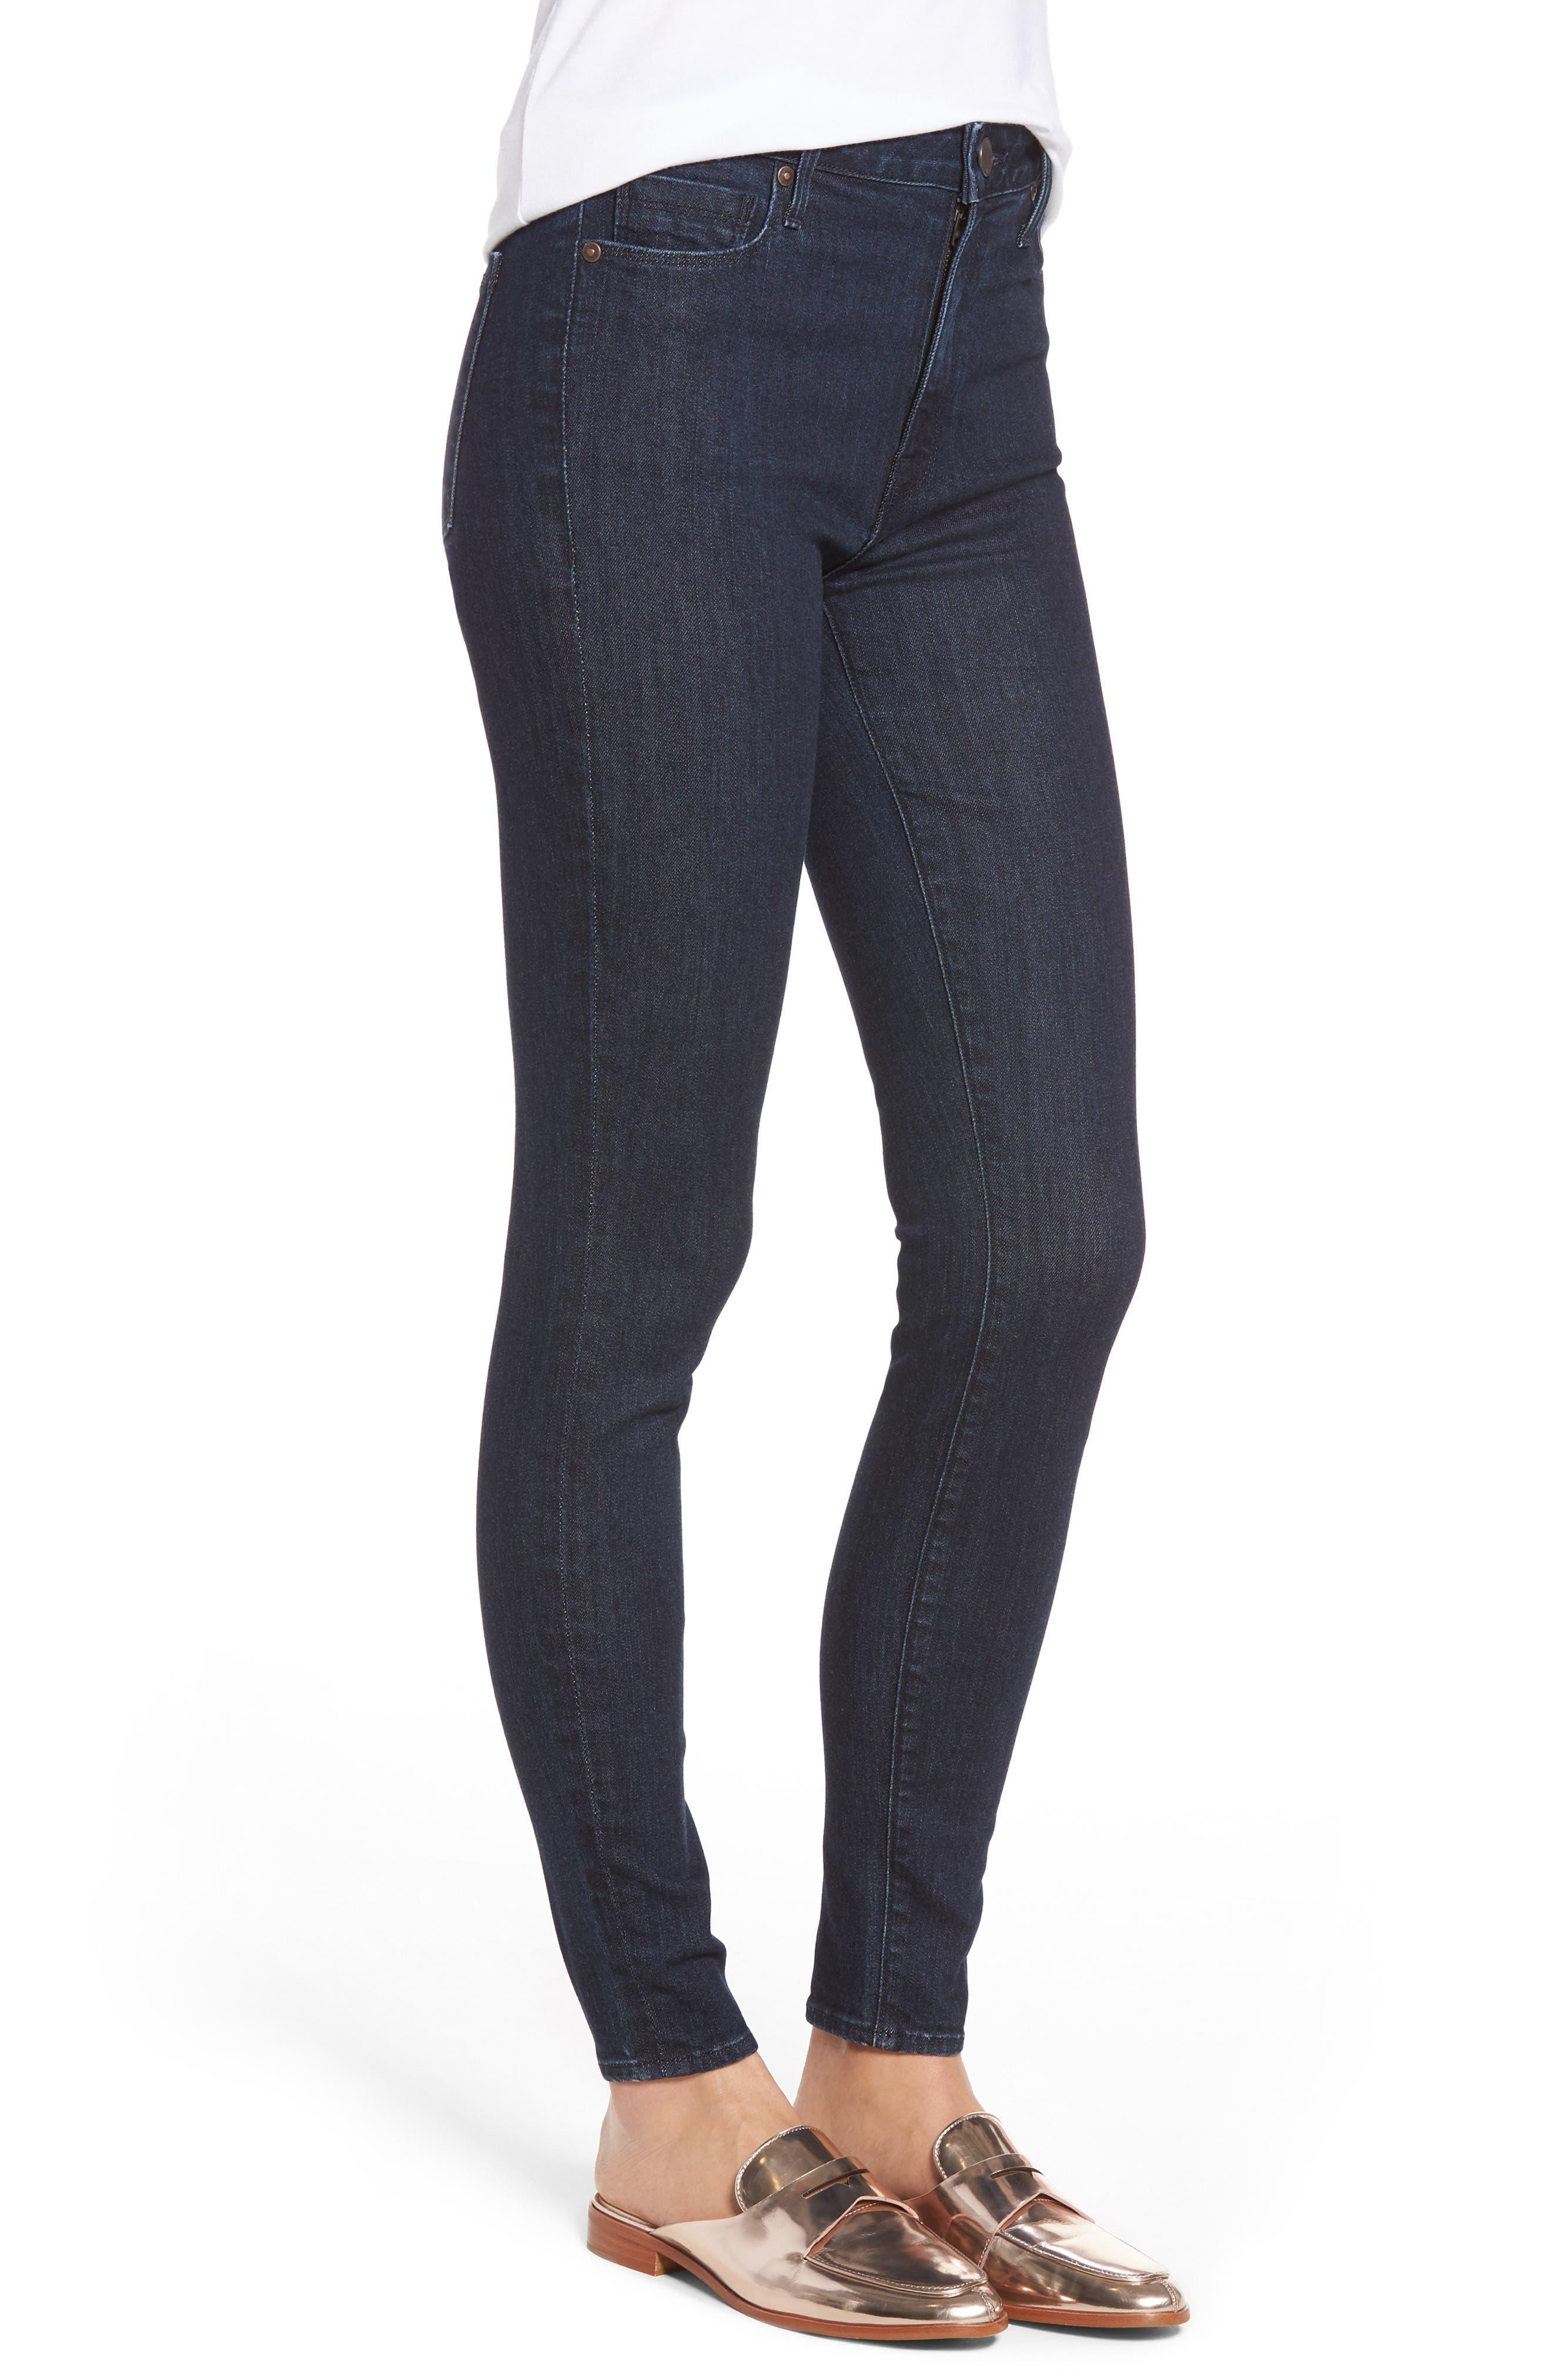 Bombshell High Waist Stretch Skinny Jeans,                             Alternate thumbnail 8, color,